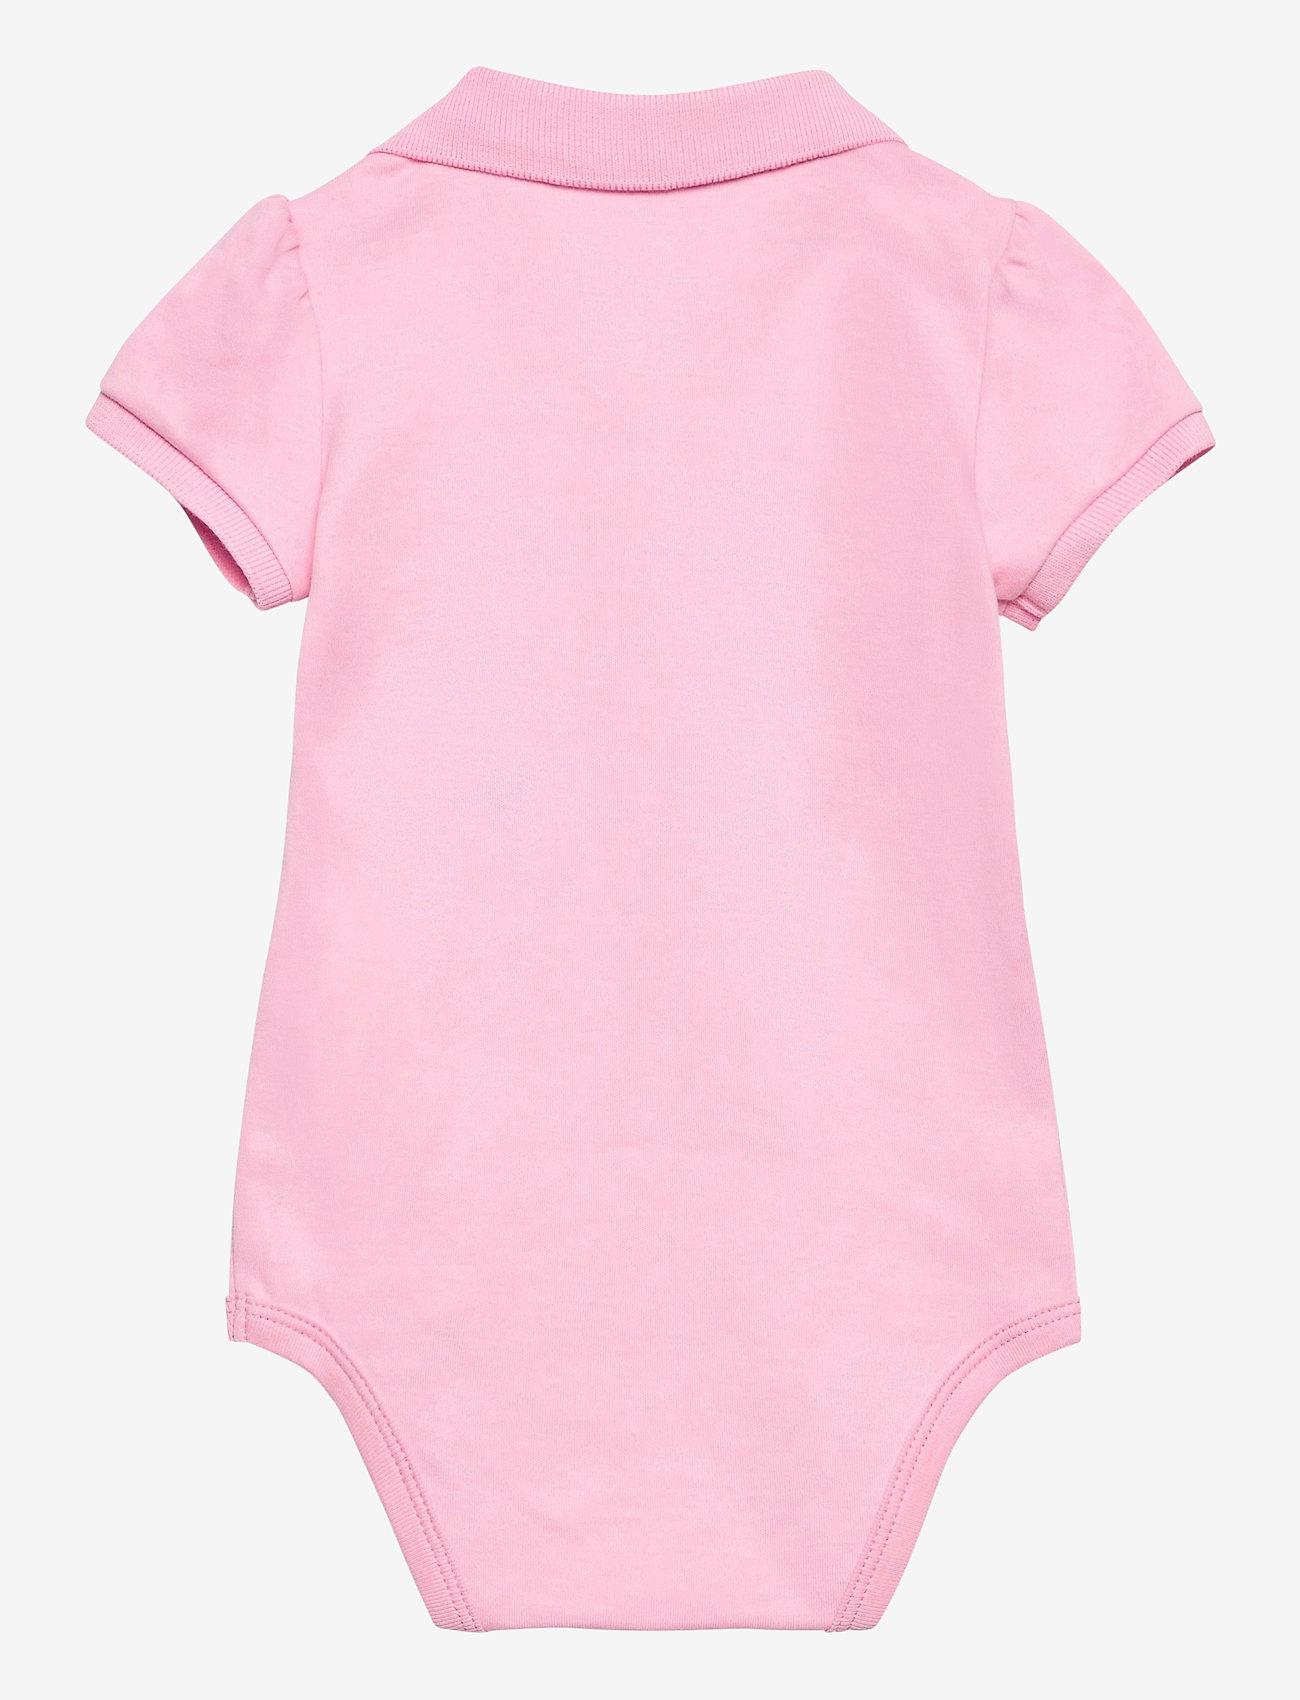 Ralph Lauren Baby - INTERLOCK-POLO BDYSUIT-OP-BDY - short-sleeved - carmel pink/white - 1